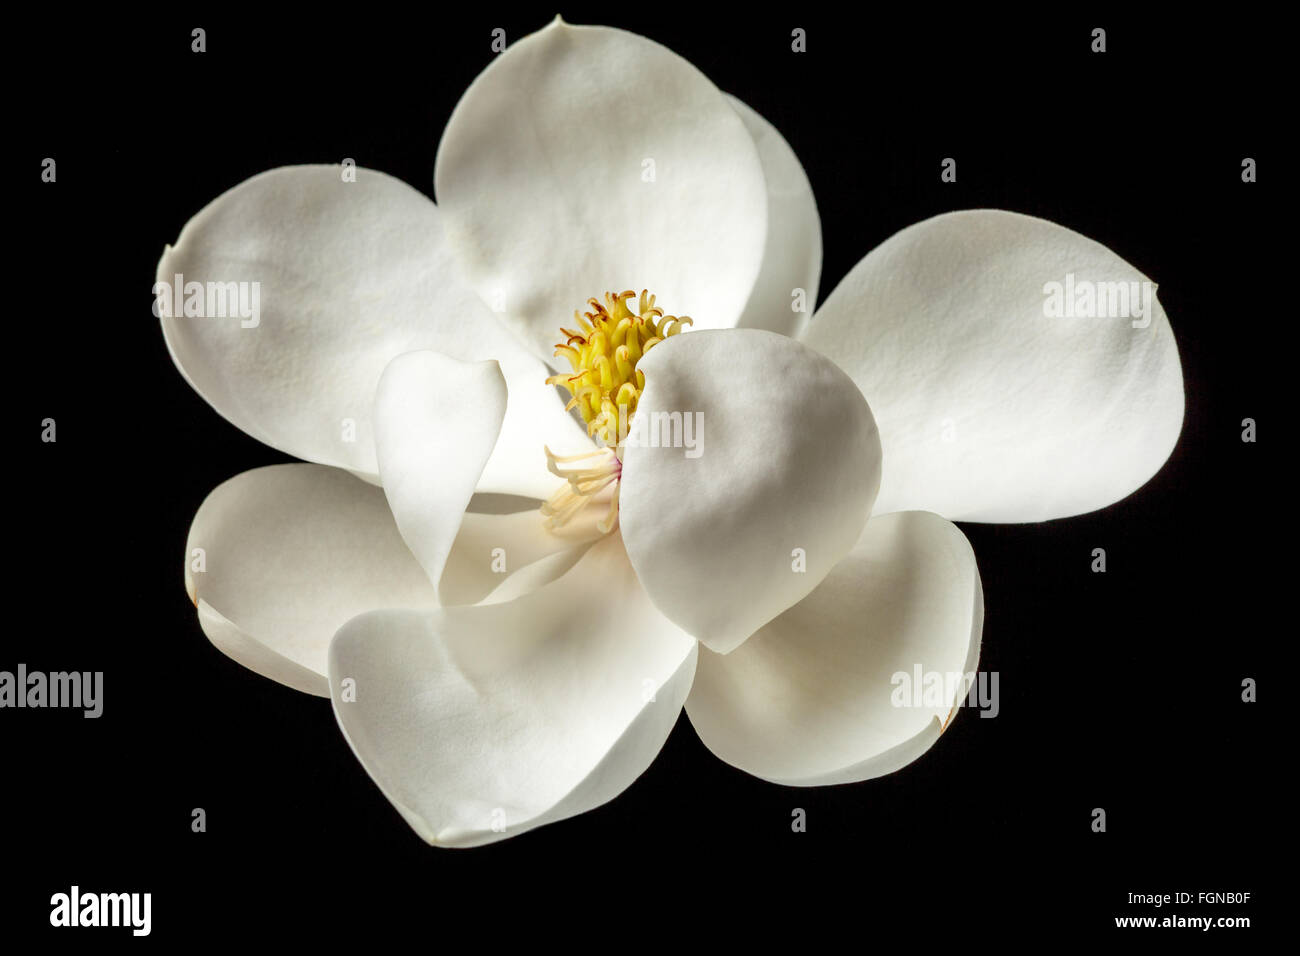 Magnolia Flower White Magnolias Floral Flowers Stock Photo 96355967